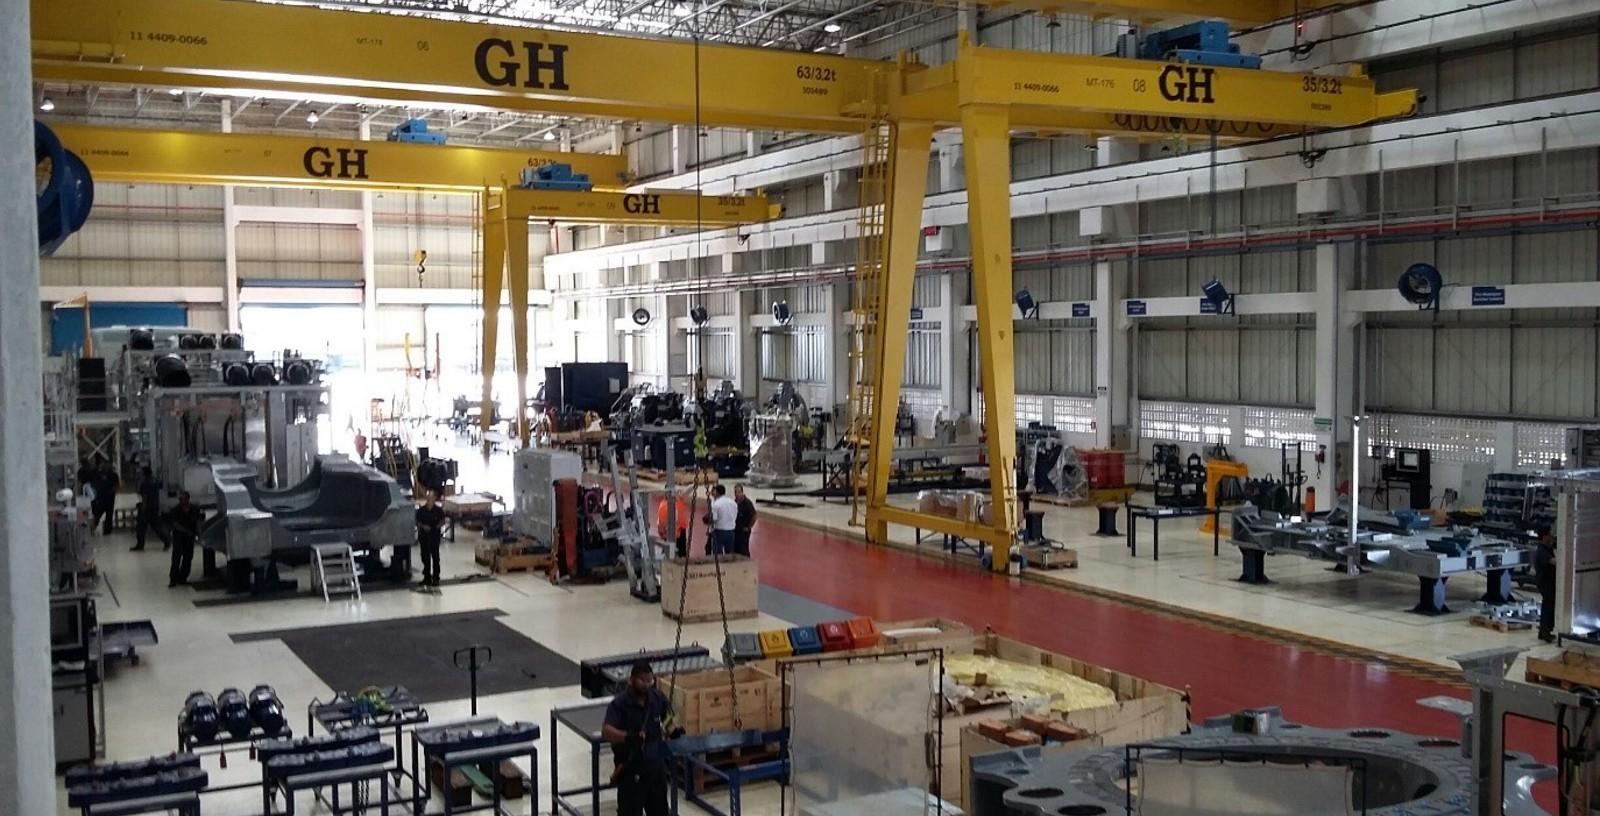 GAMESA_Wind_turbine_manufacturing_plant_Brazil_Idom_03